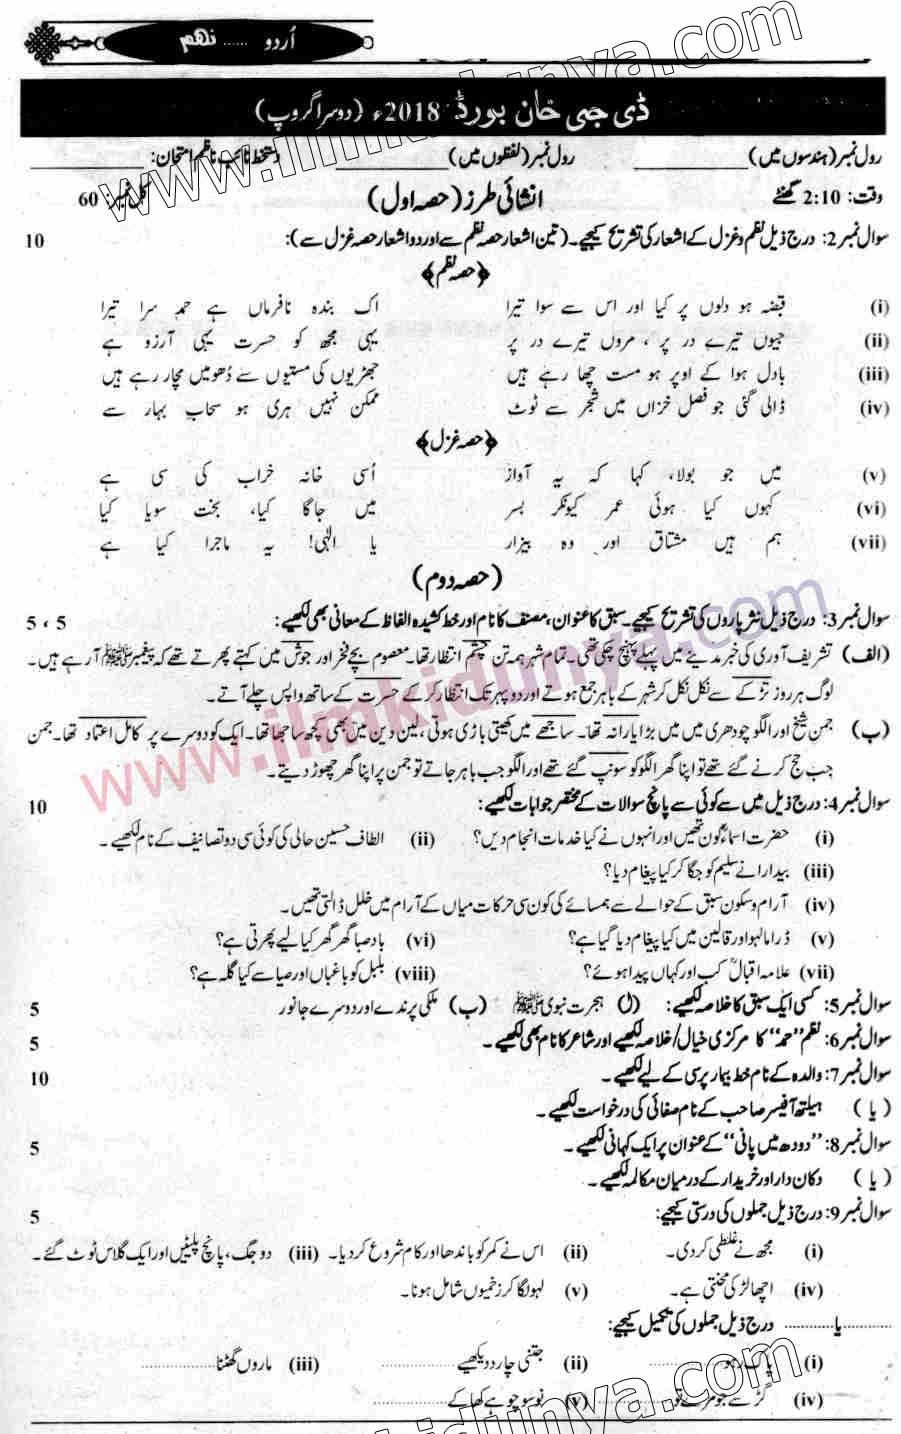 Past Papers 2018 DG Khan Board 9th Class Urdu Group 2